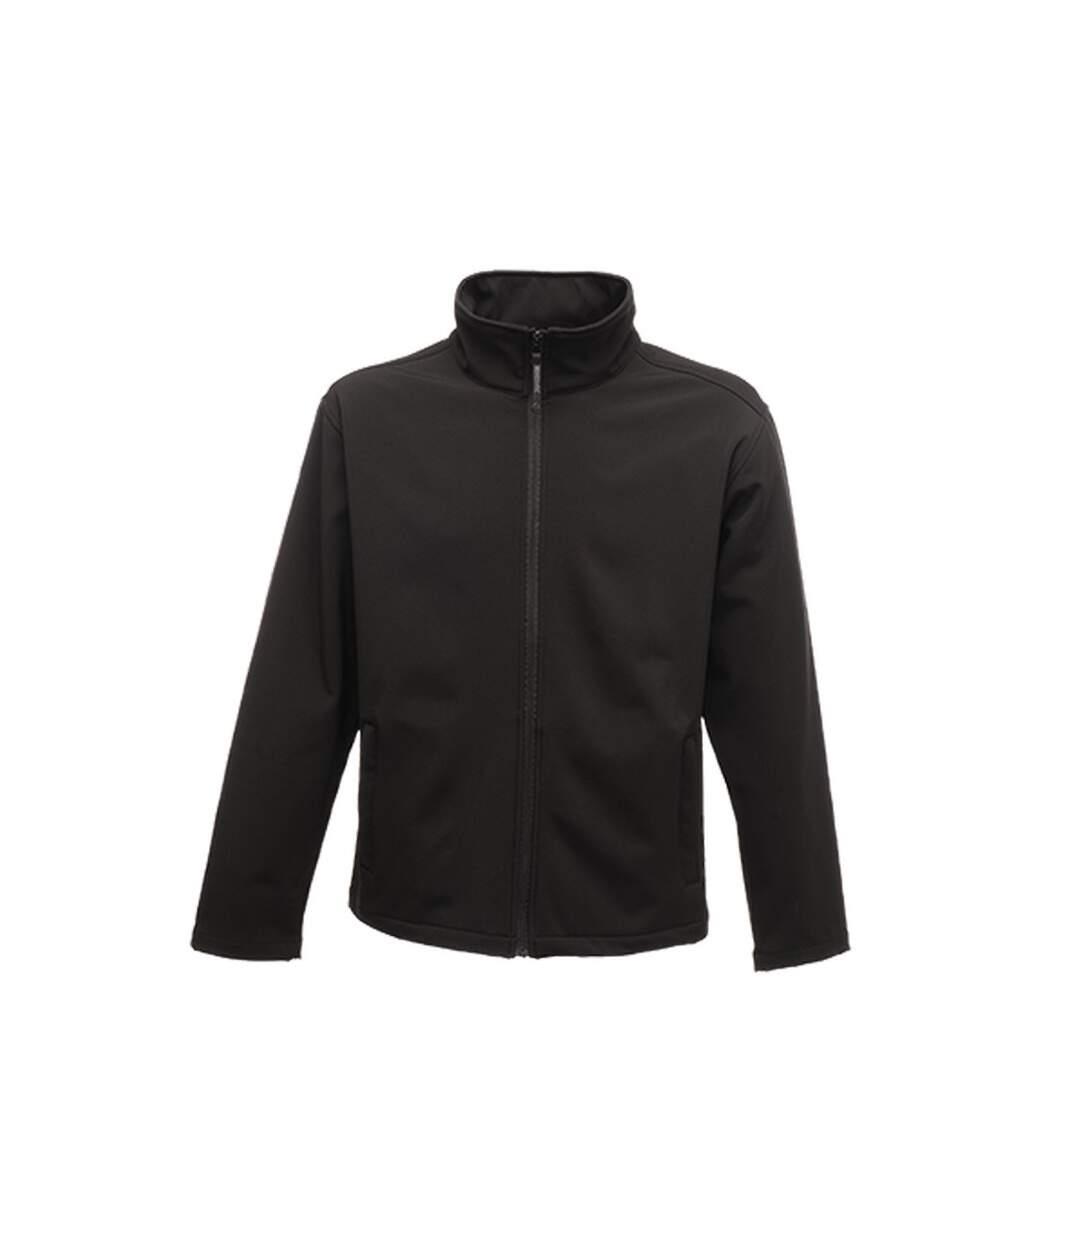 Regatta Classic Mens Water Repellent Softshell Jacket (Black) - UTRG2166